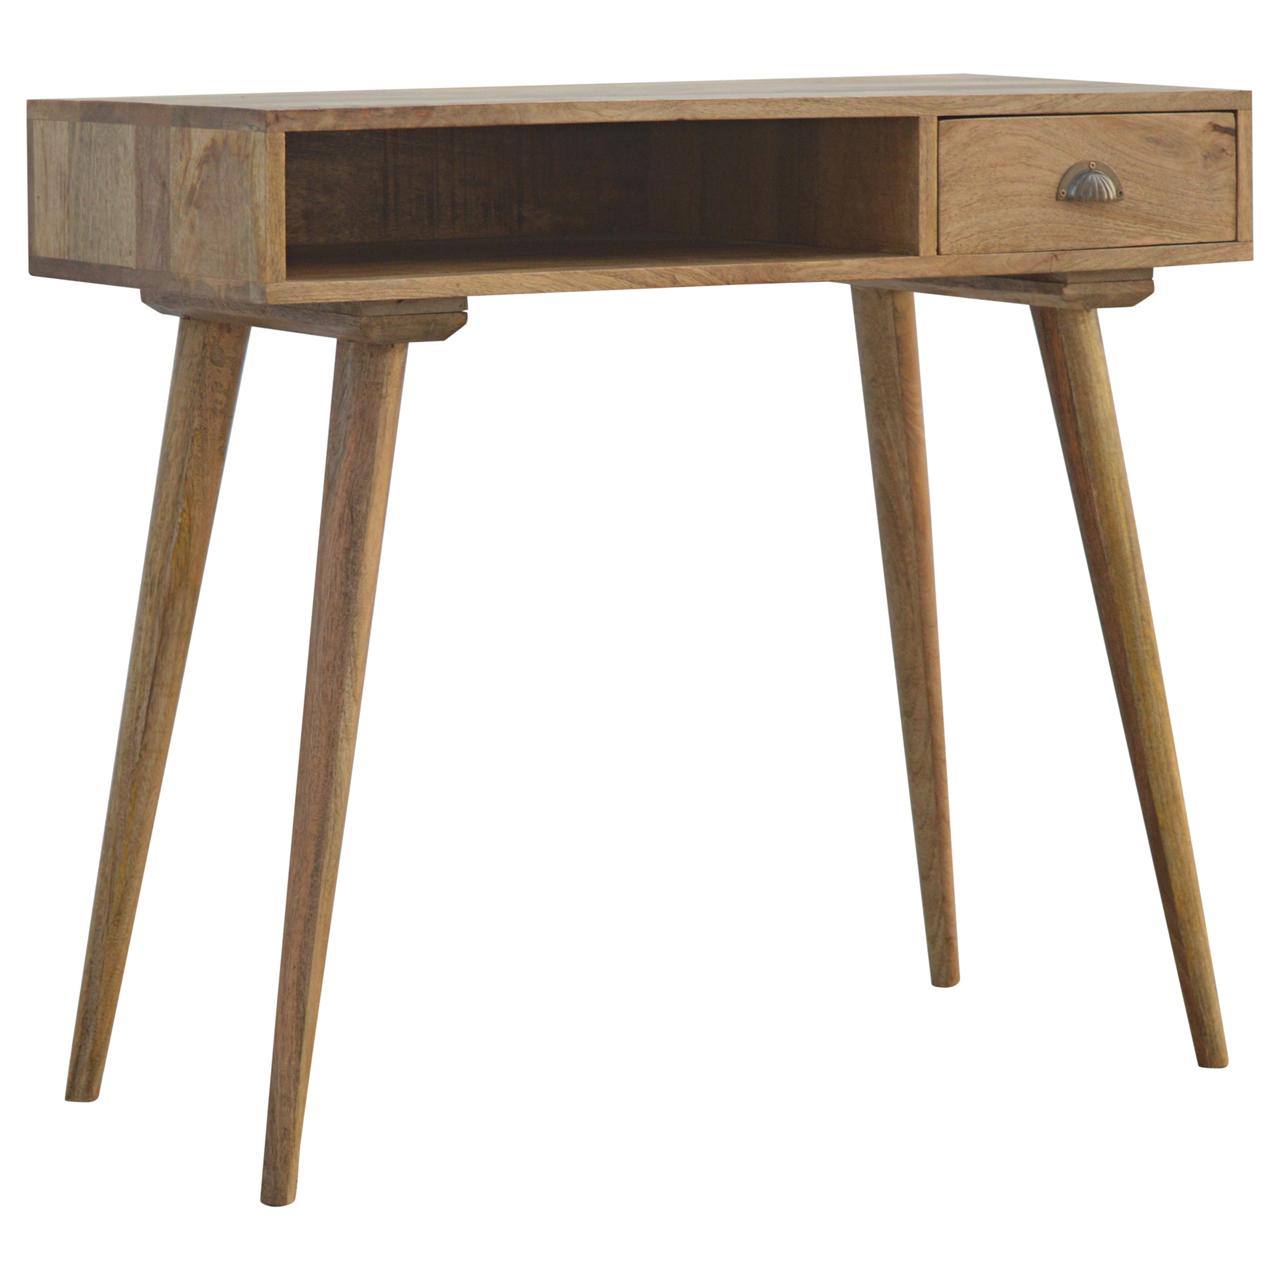 IN129 Solid Wood Open Shelf 1 Drawer Writing Desk